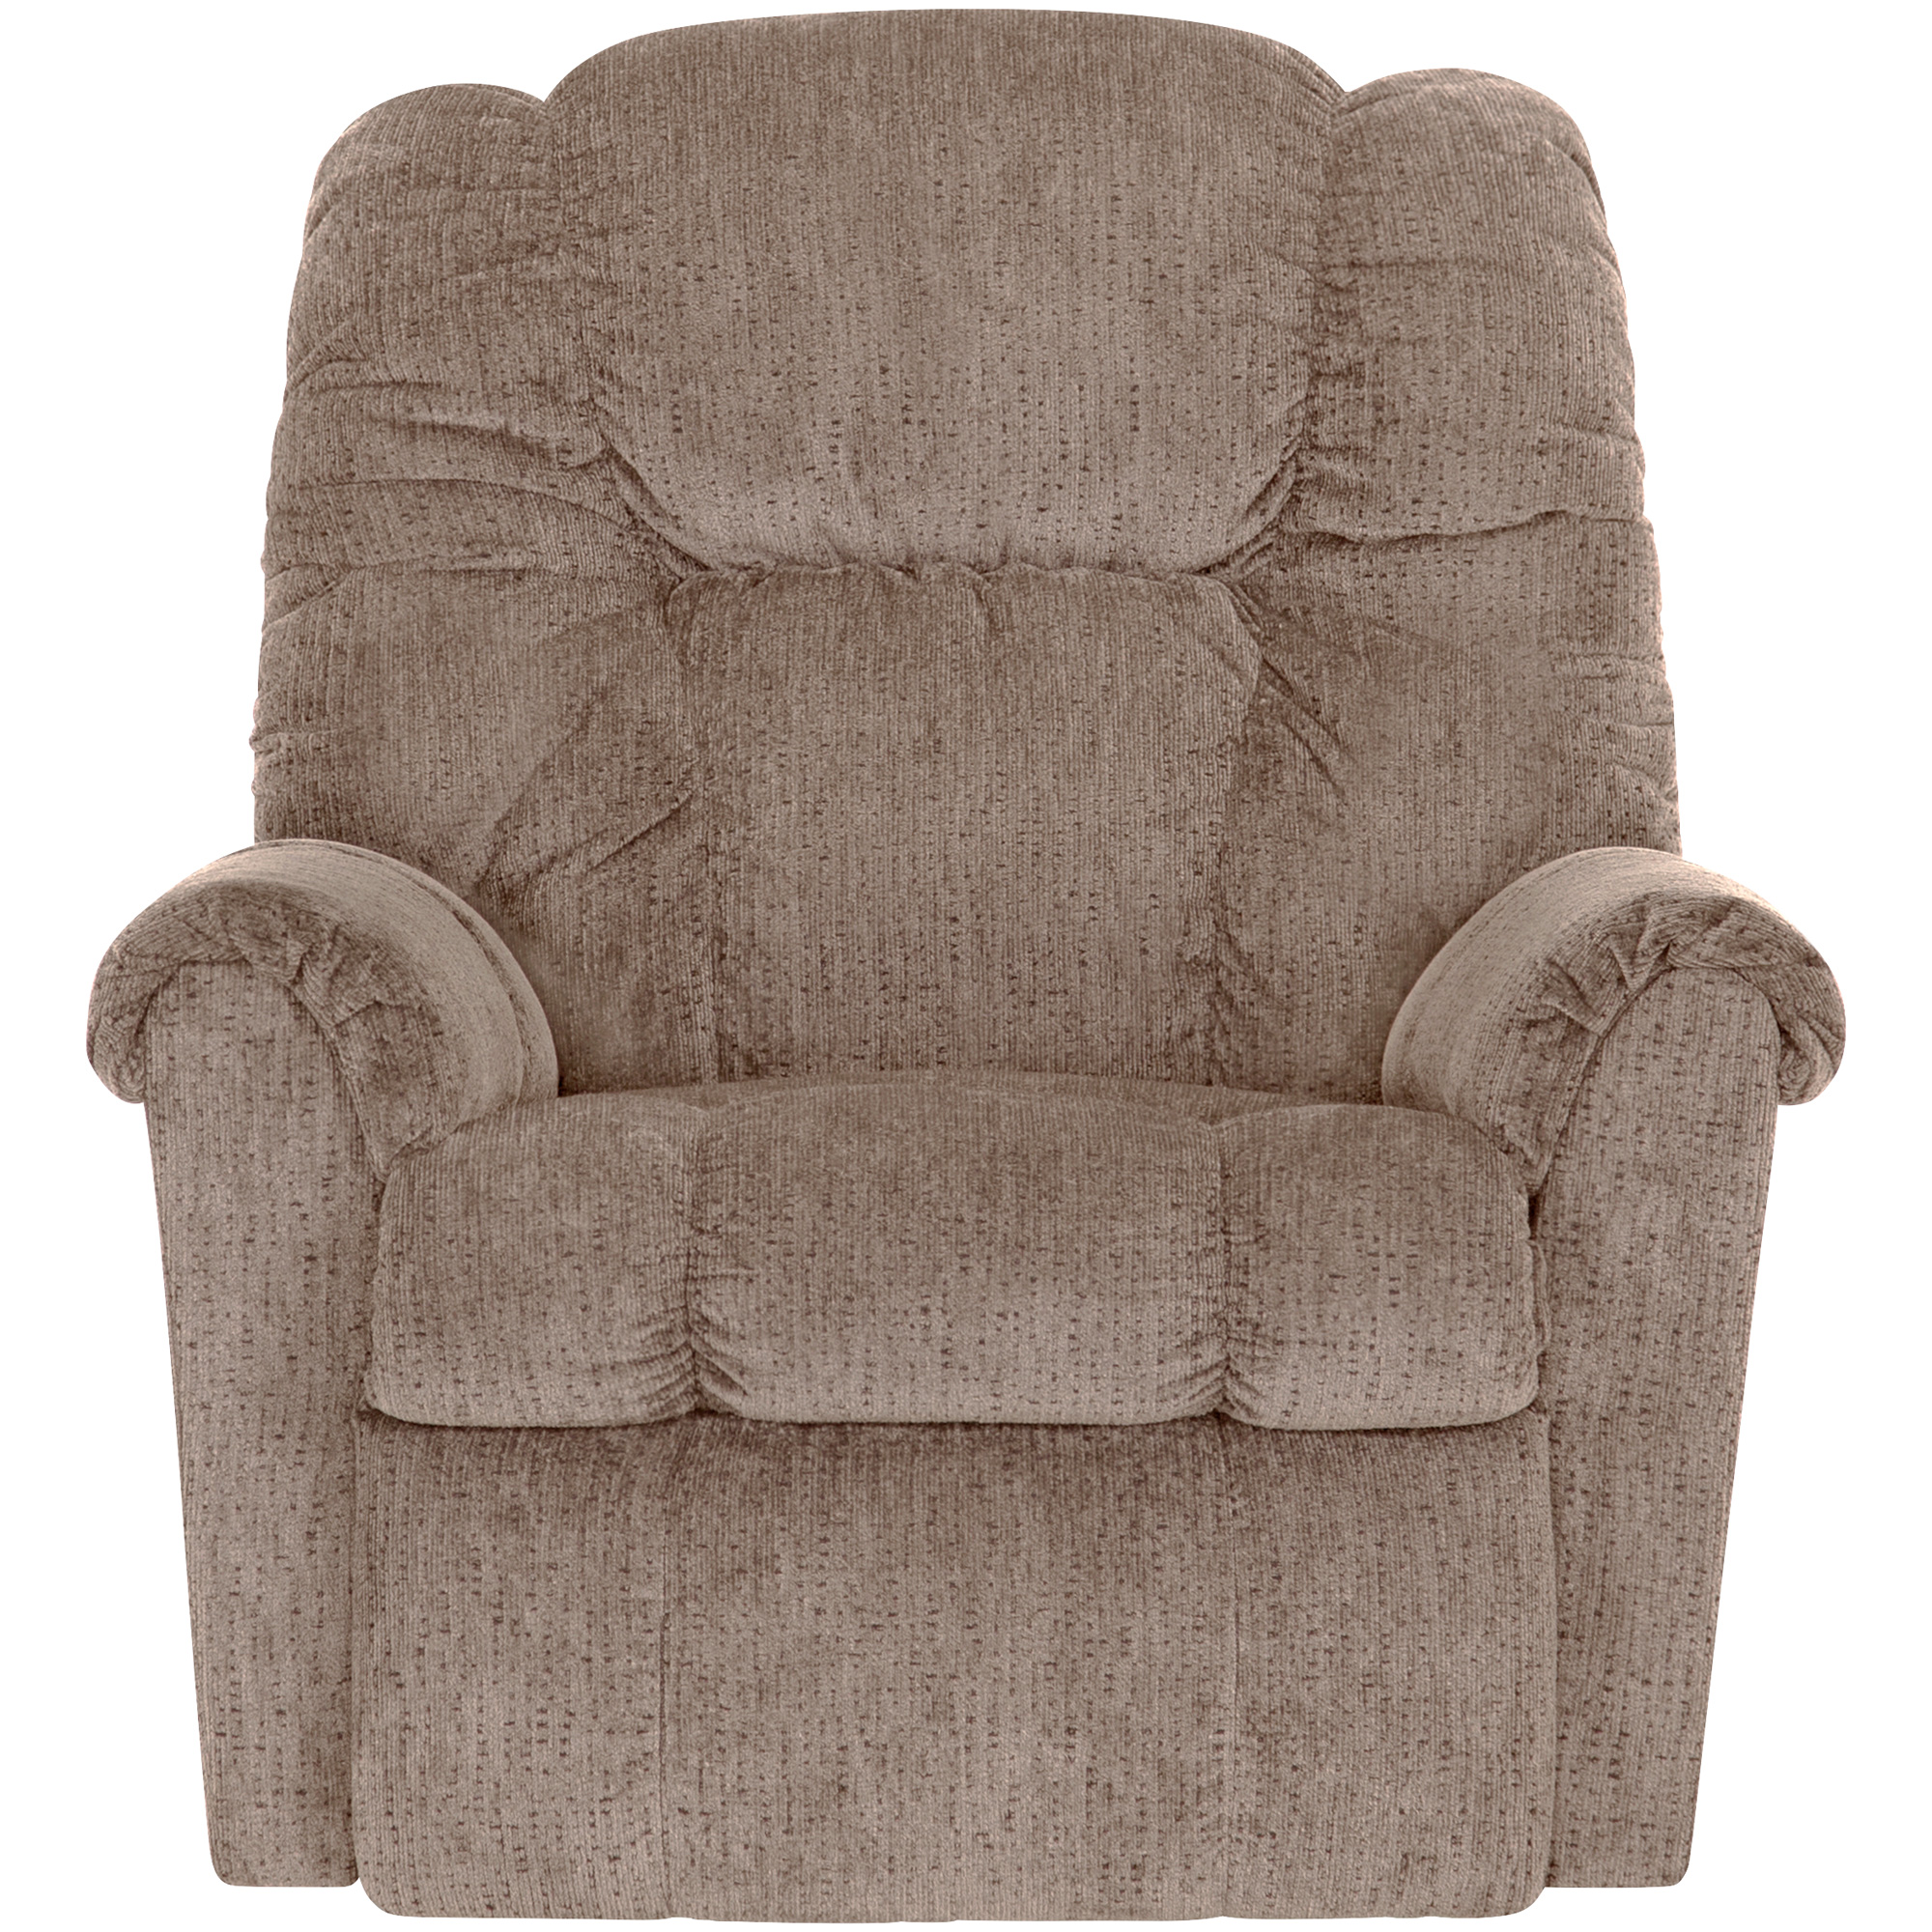 Franklin | Draco Toffee Rocker Recliner Chair